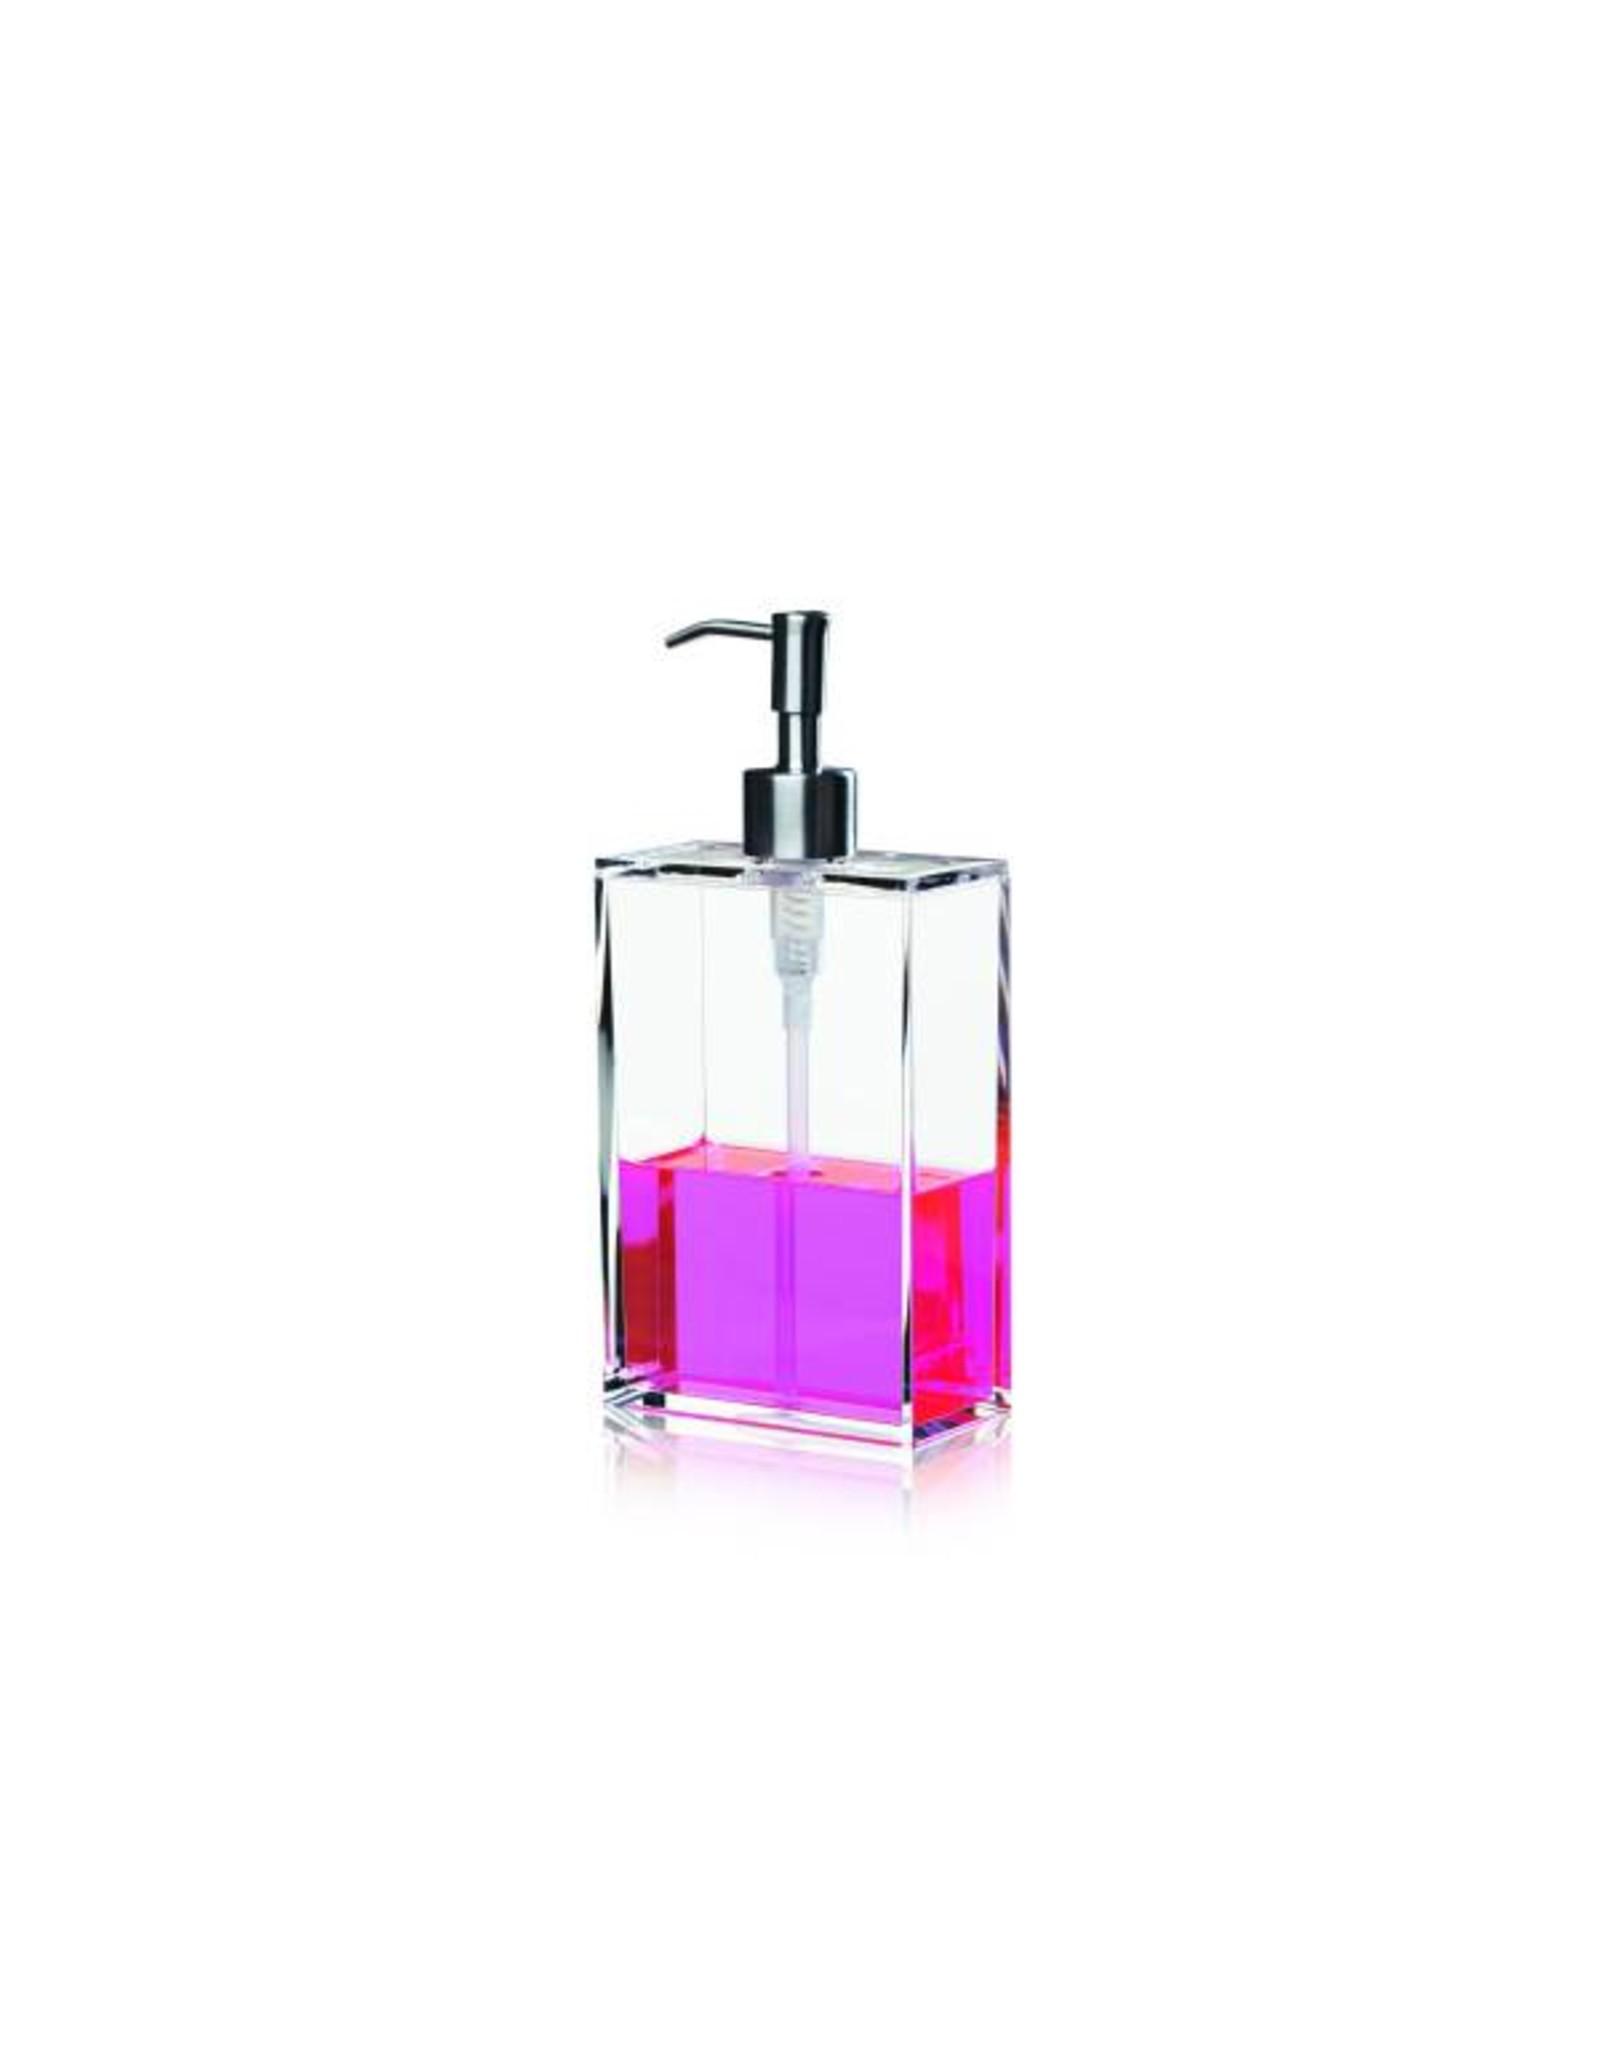 Nomess Copenhagen Clear Soap Dispenser